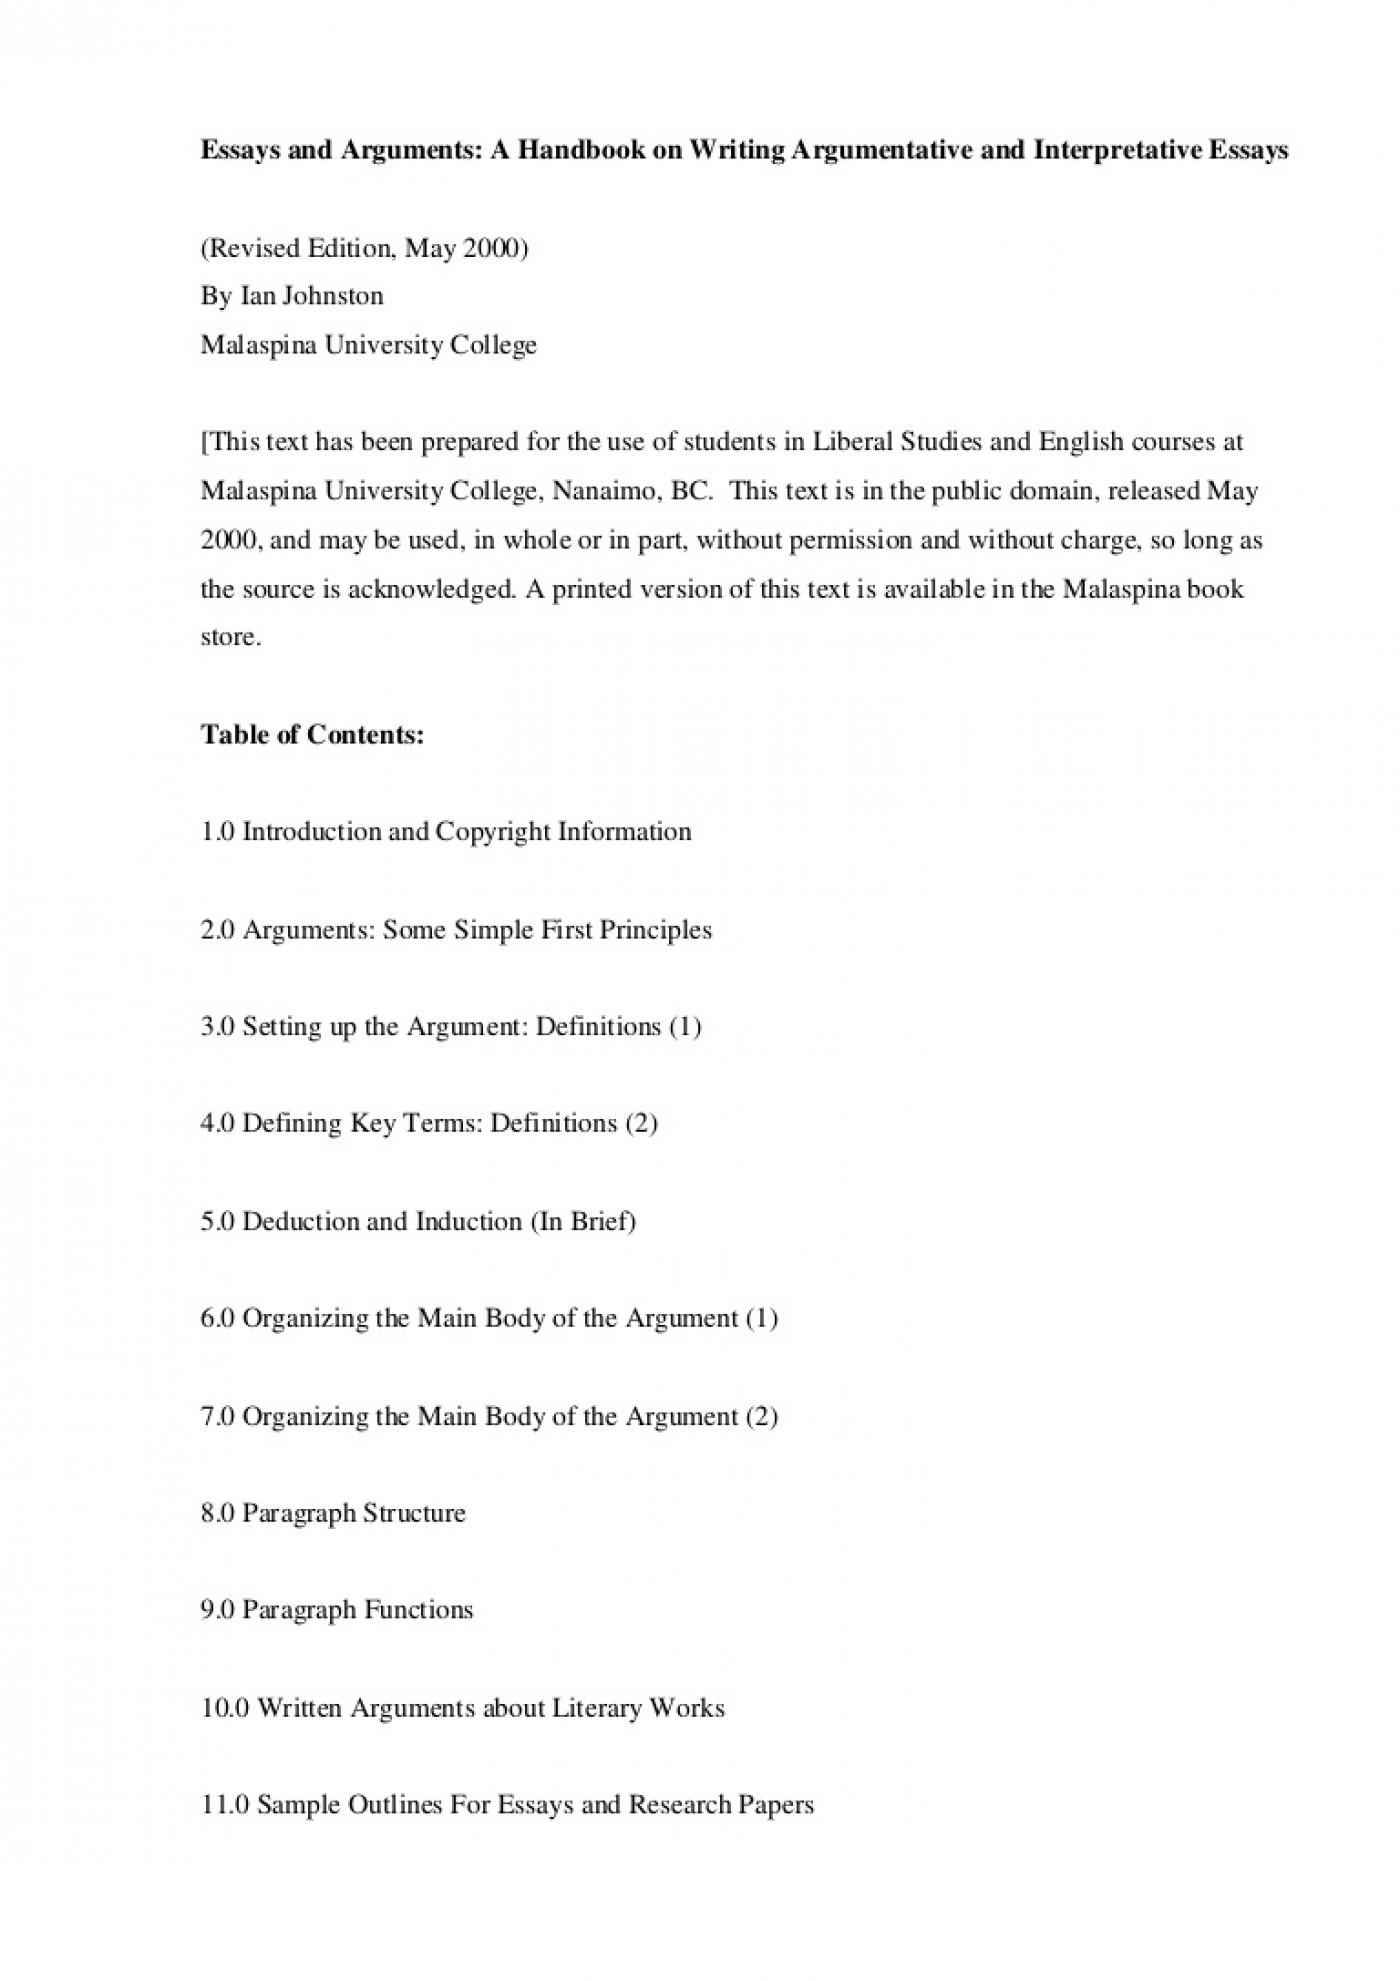 Higher computing coursework task 2013